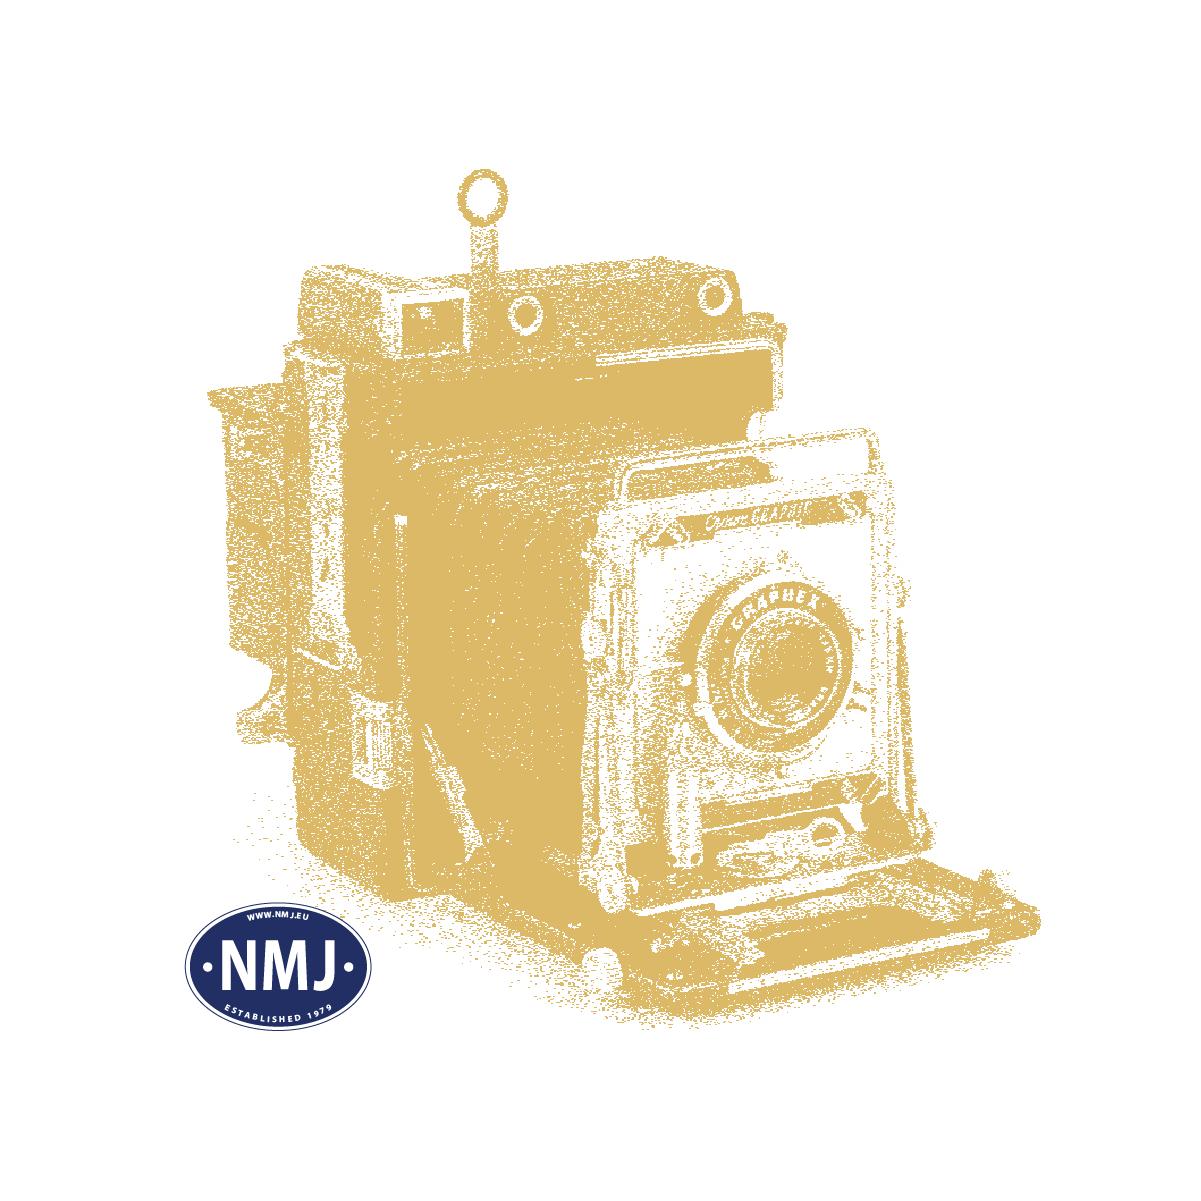 NMJ0G4-3 - NMJ Superline NSB Gbkls 20 76 158 5796-9, Spor 0